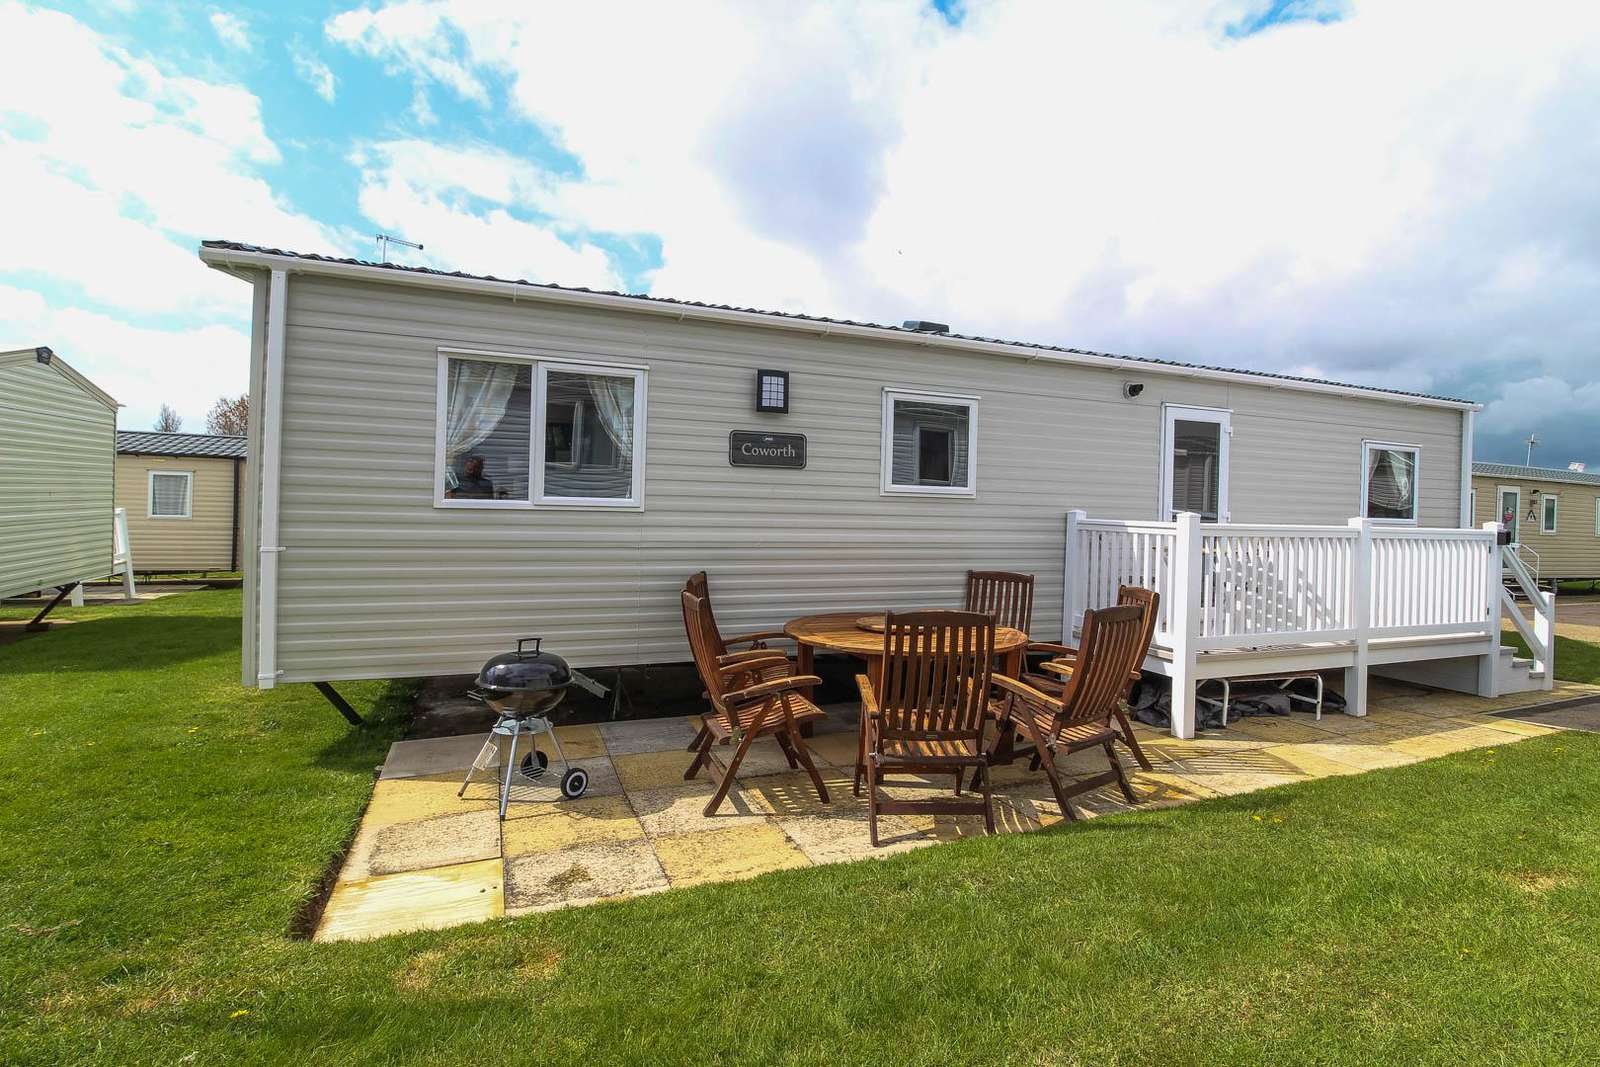 80020F – Fairways area, 3 bed, 8 berth caravan with decking. Diamond-Plus rated. - property